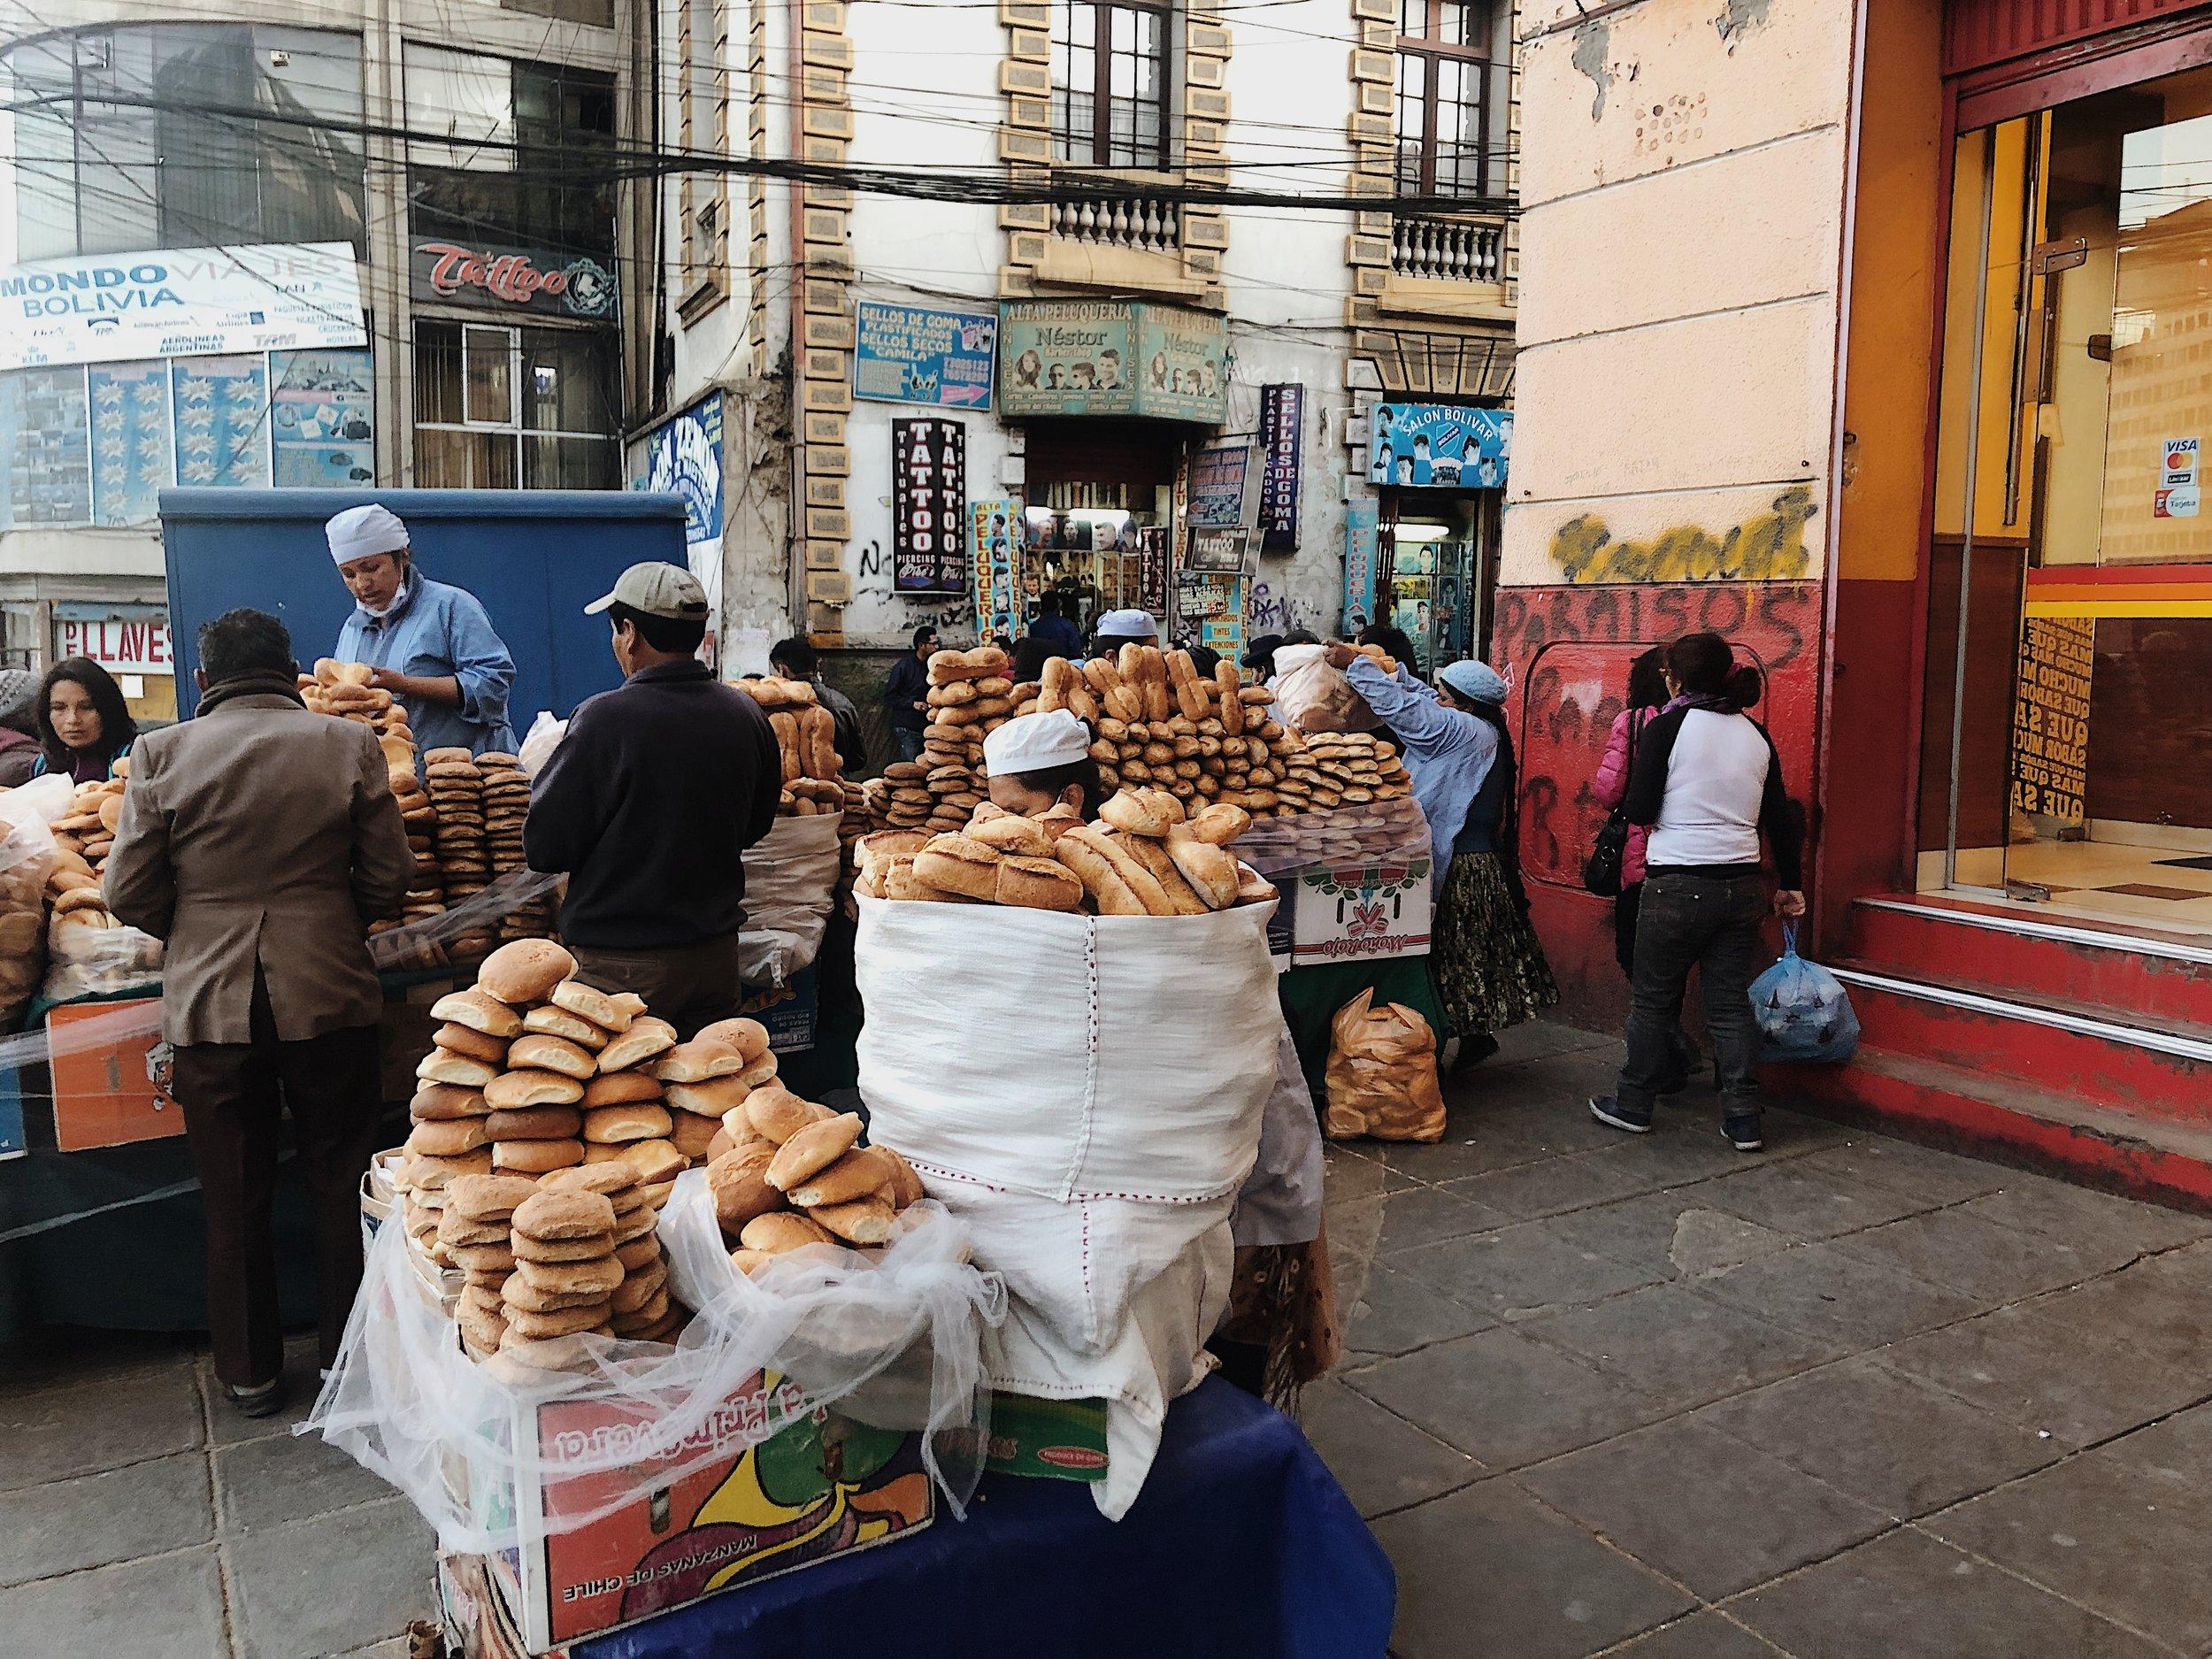 la paz bolivia bread street scene market